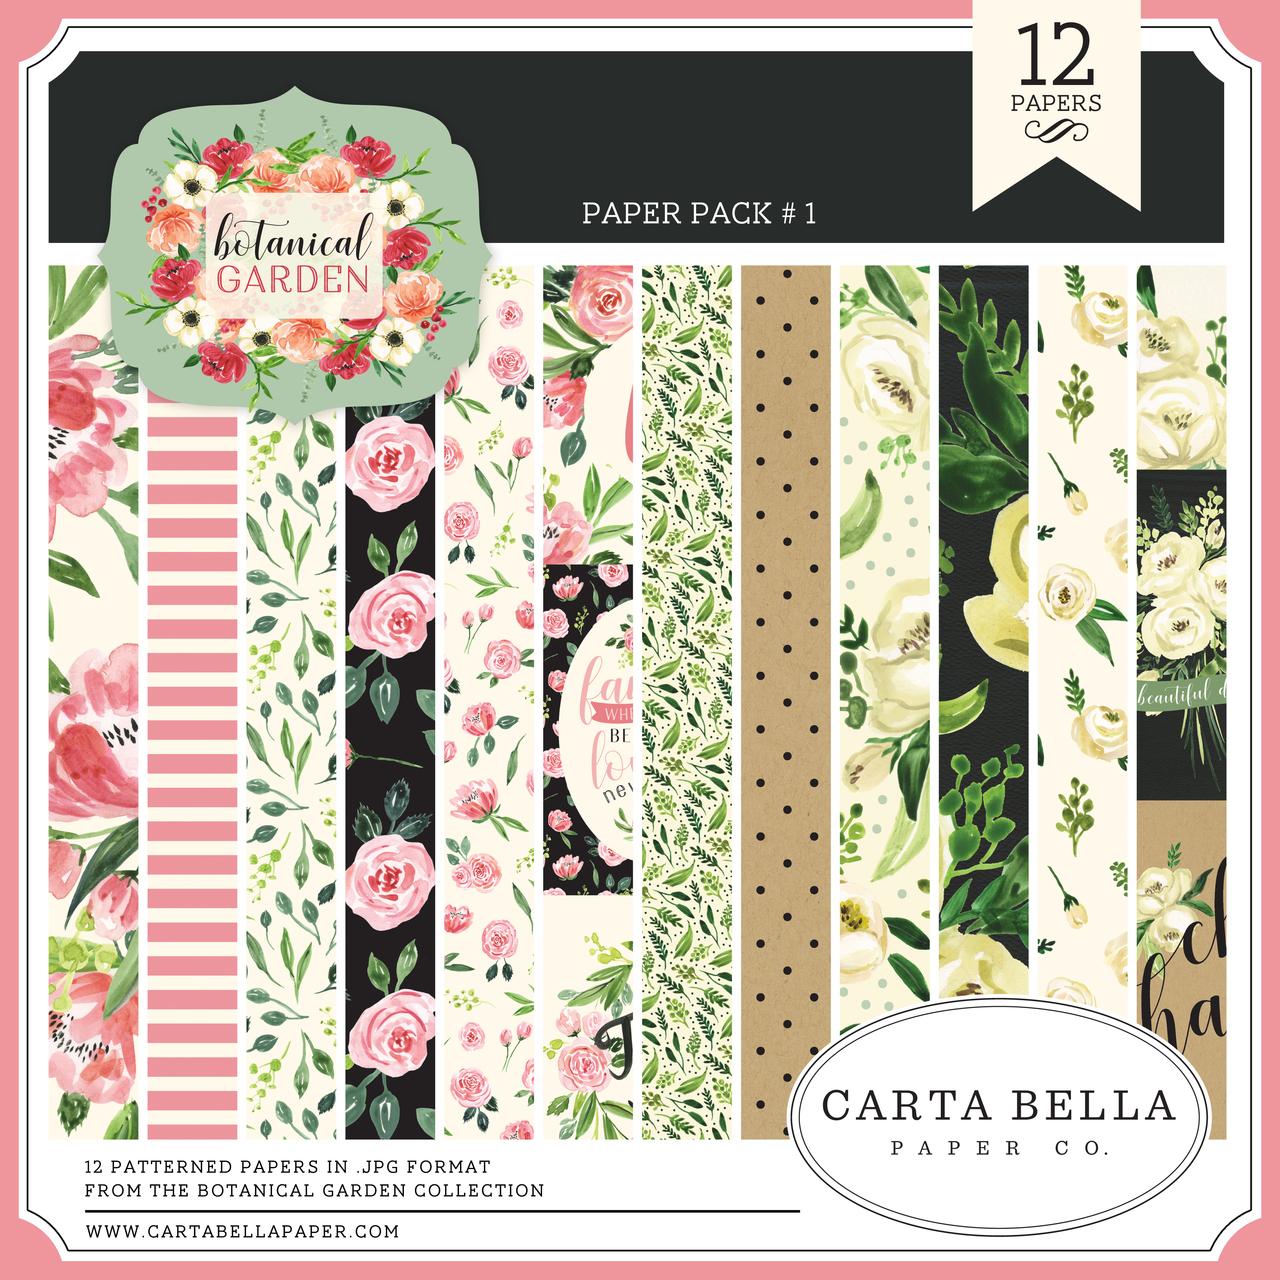 Botanical Garden Paper Pack #1